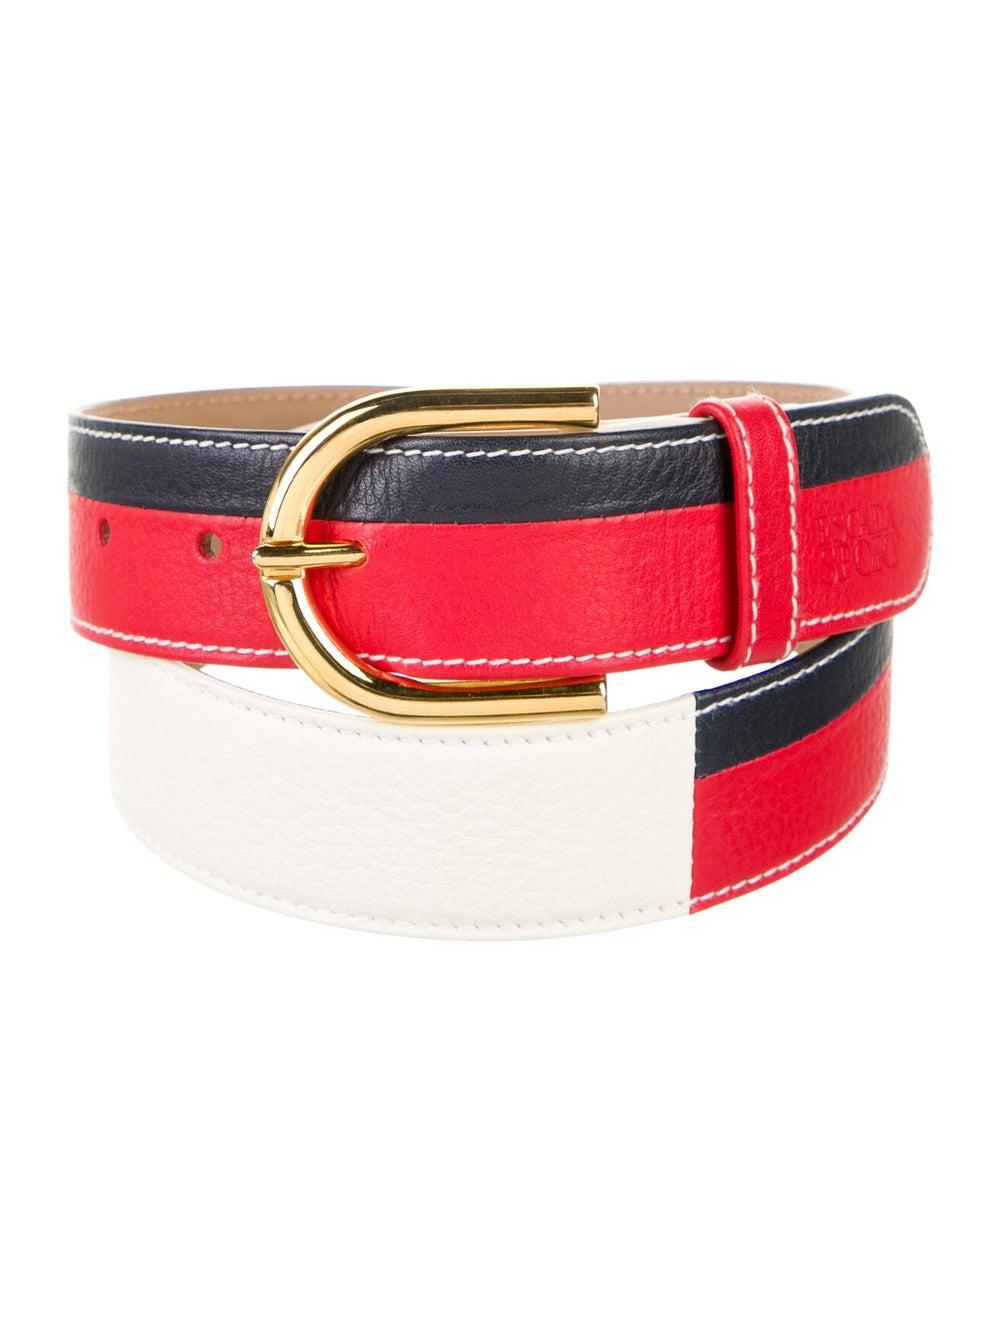 Escada Sport Leather Waist Belt Gold - image 2